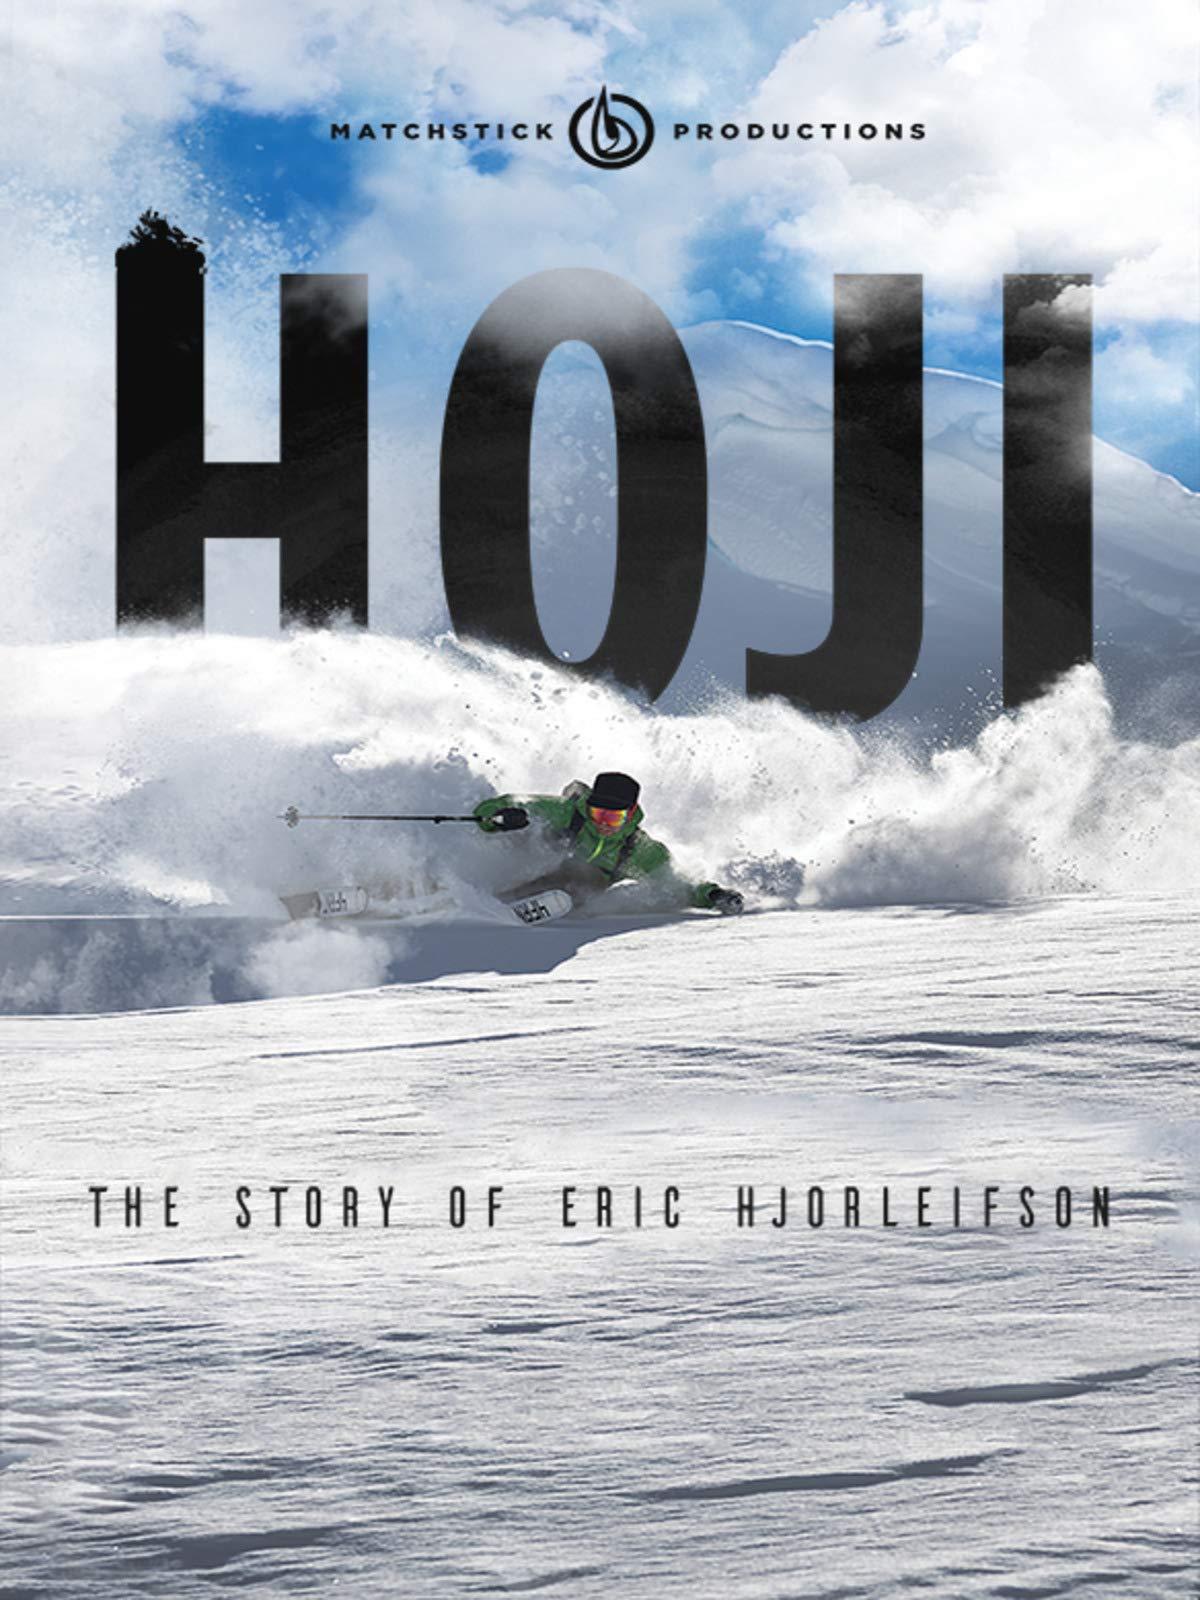 HOJI: The Story of Eric Hjorleifson on Amazon Prime Video UK